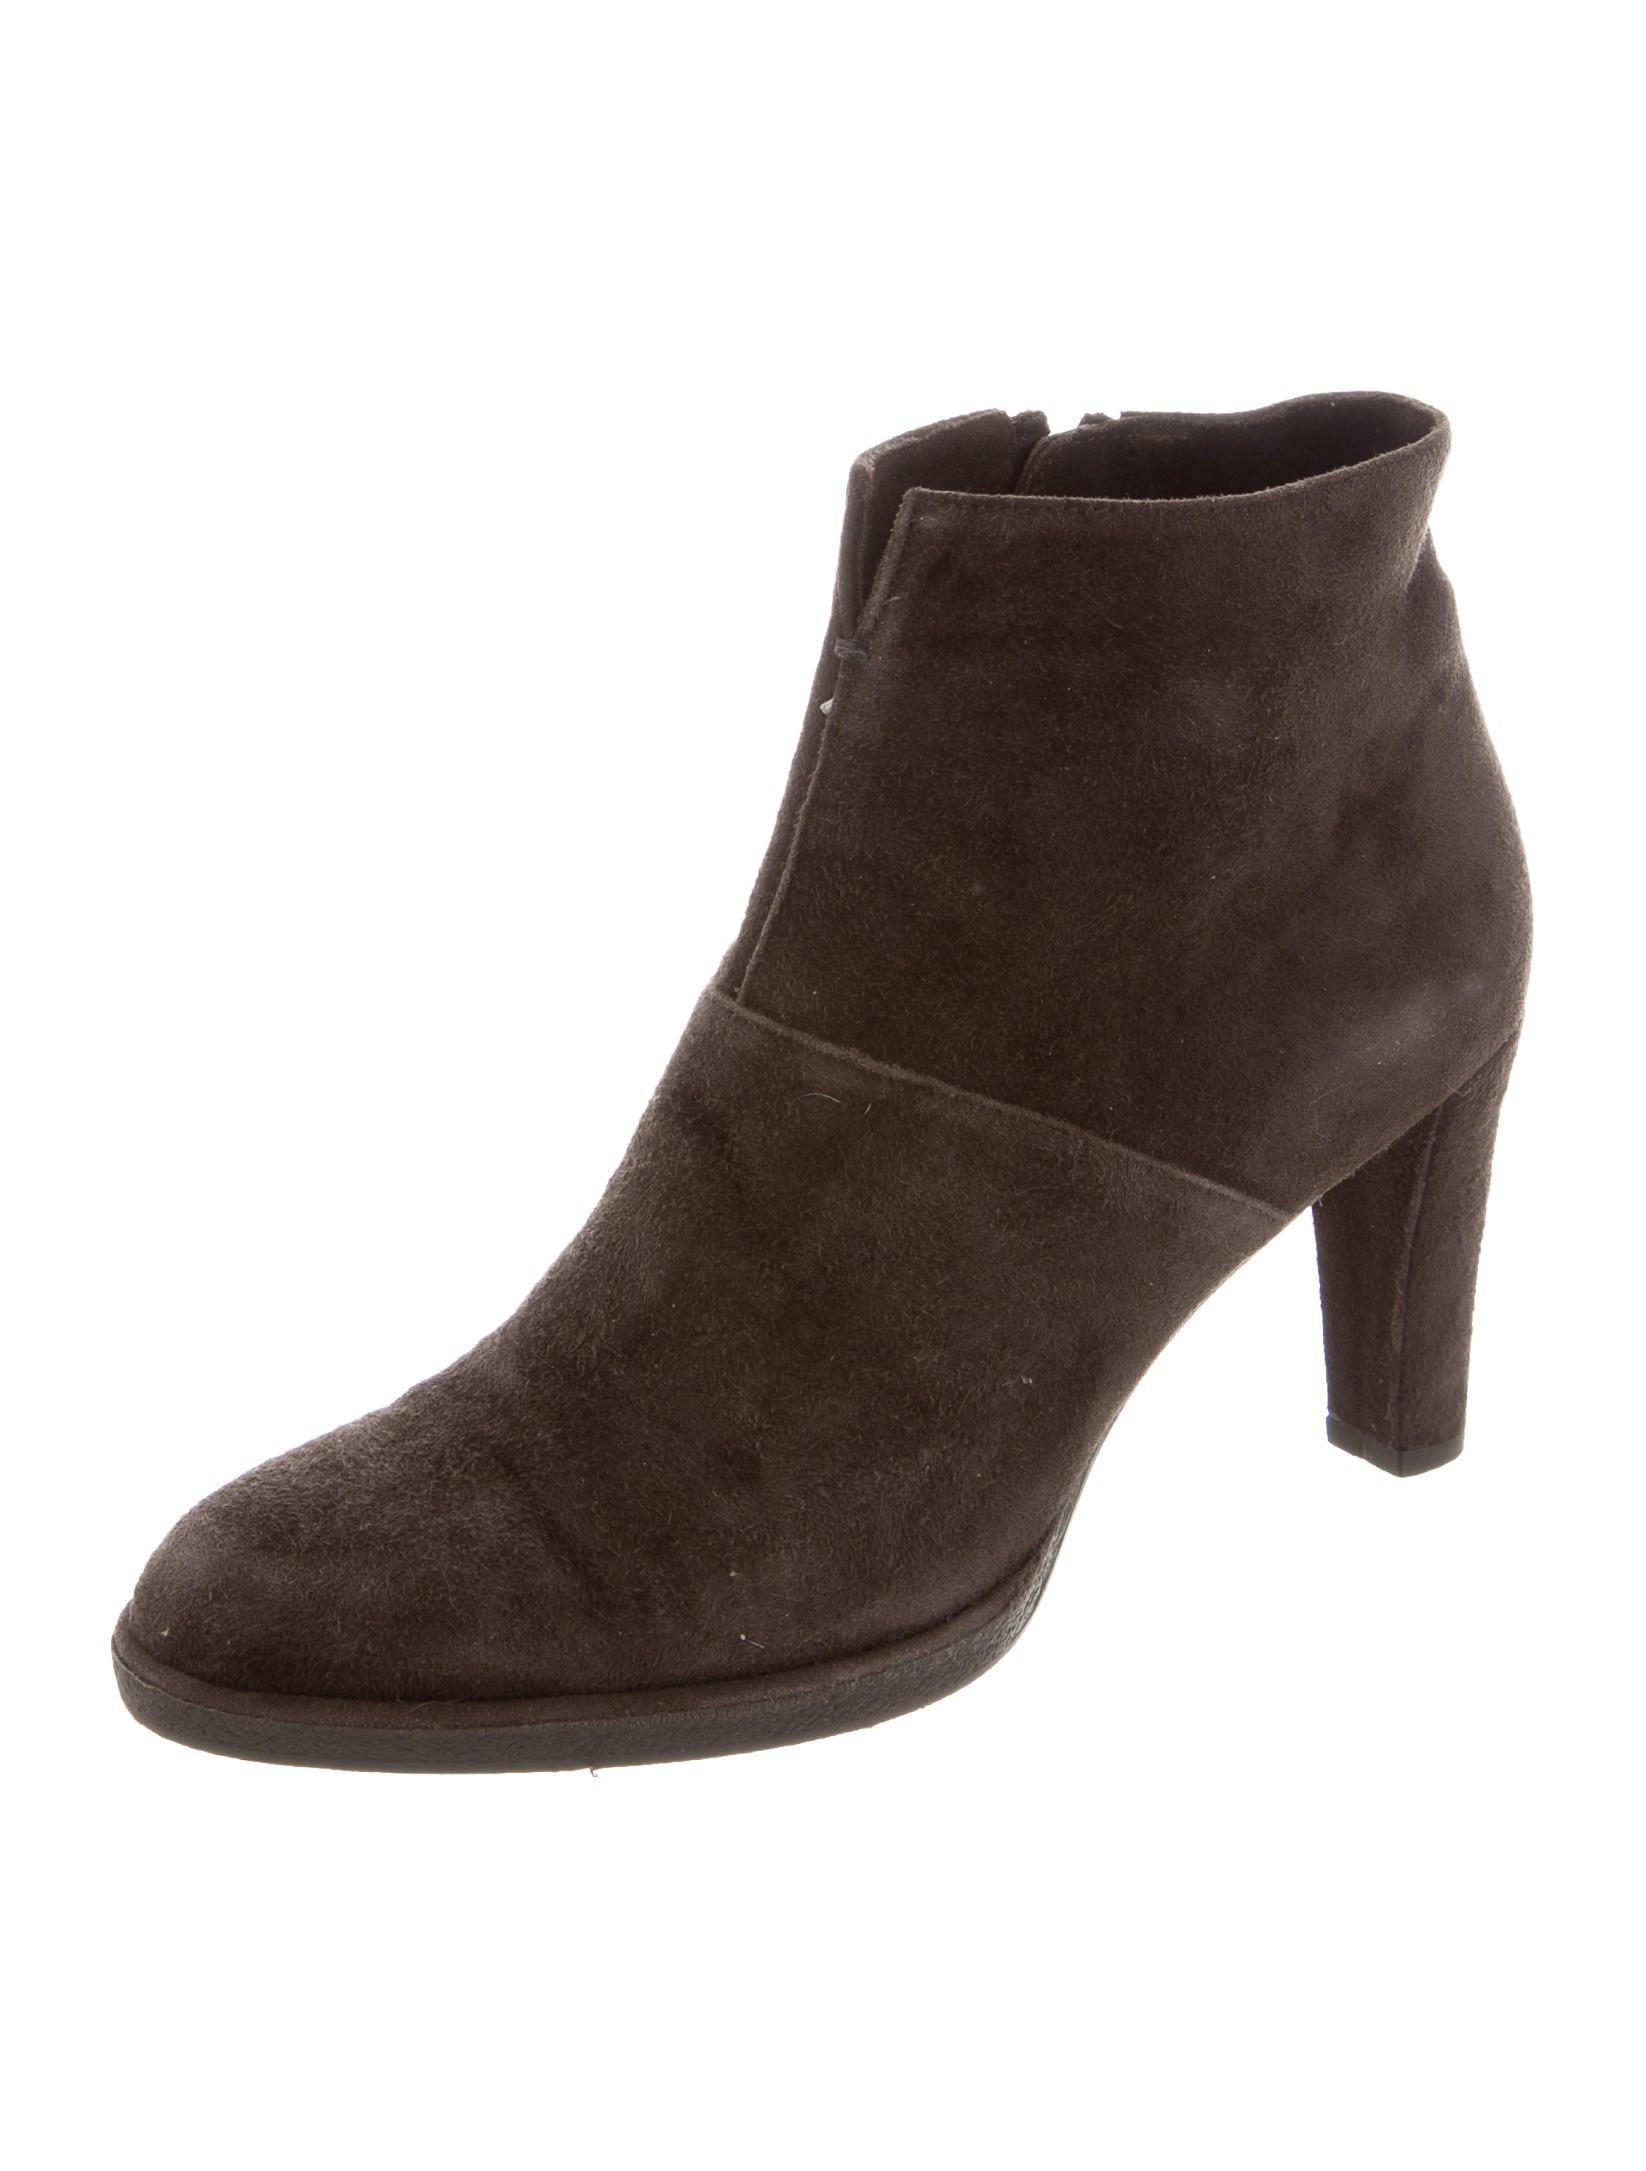 stuart weitzman suede toe ankle boots shoes